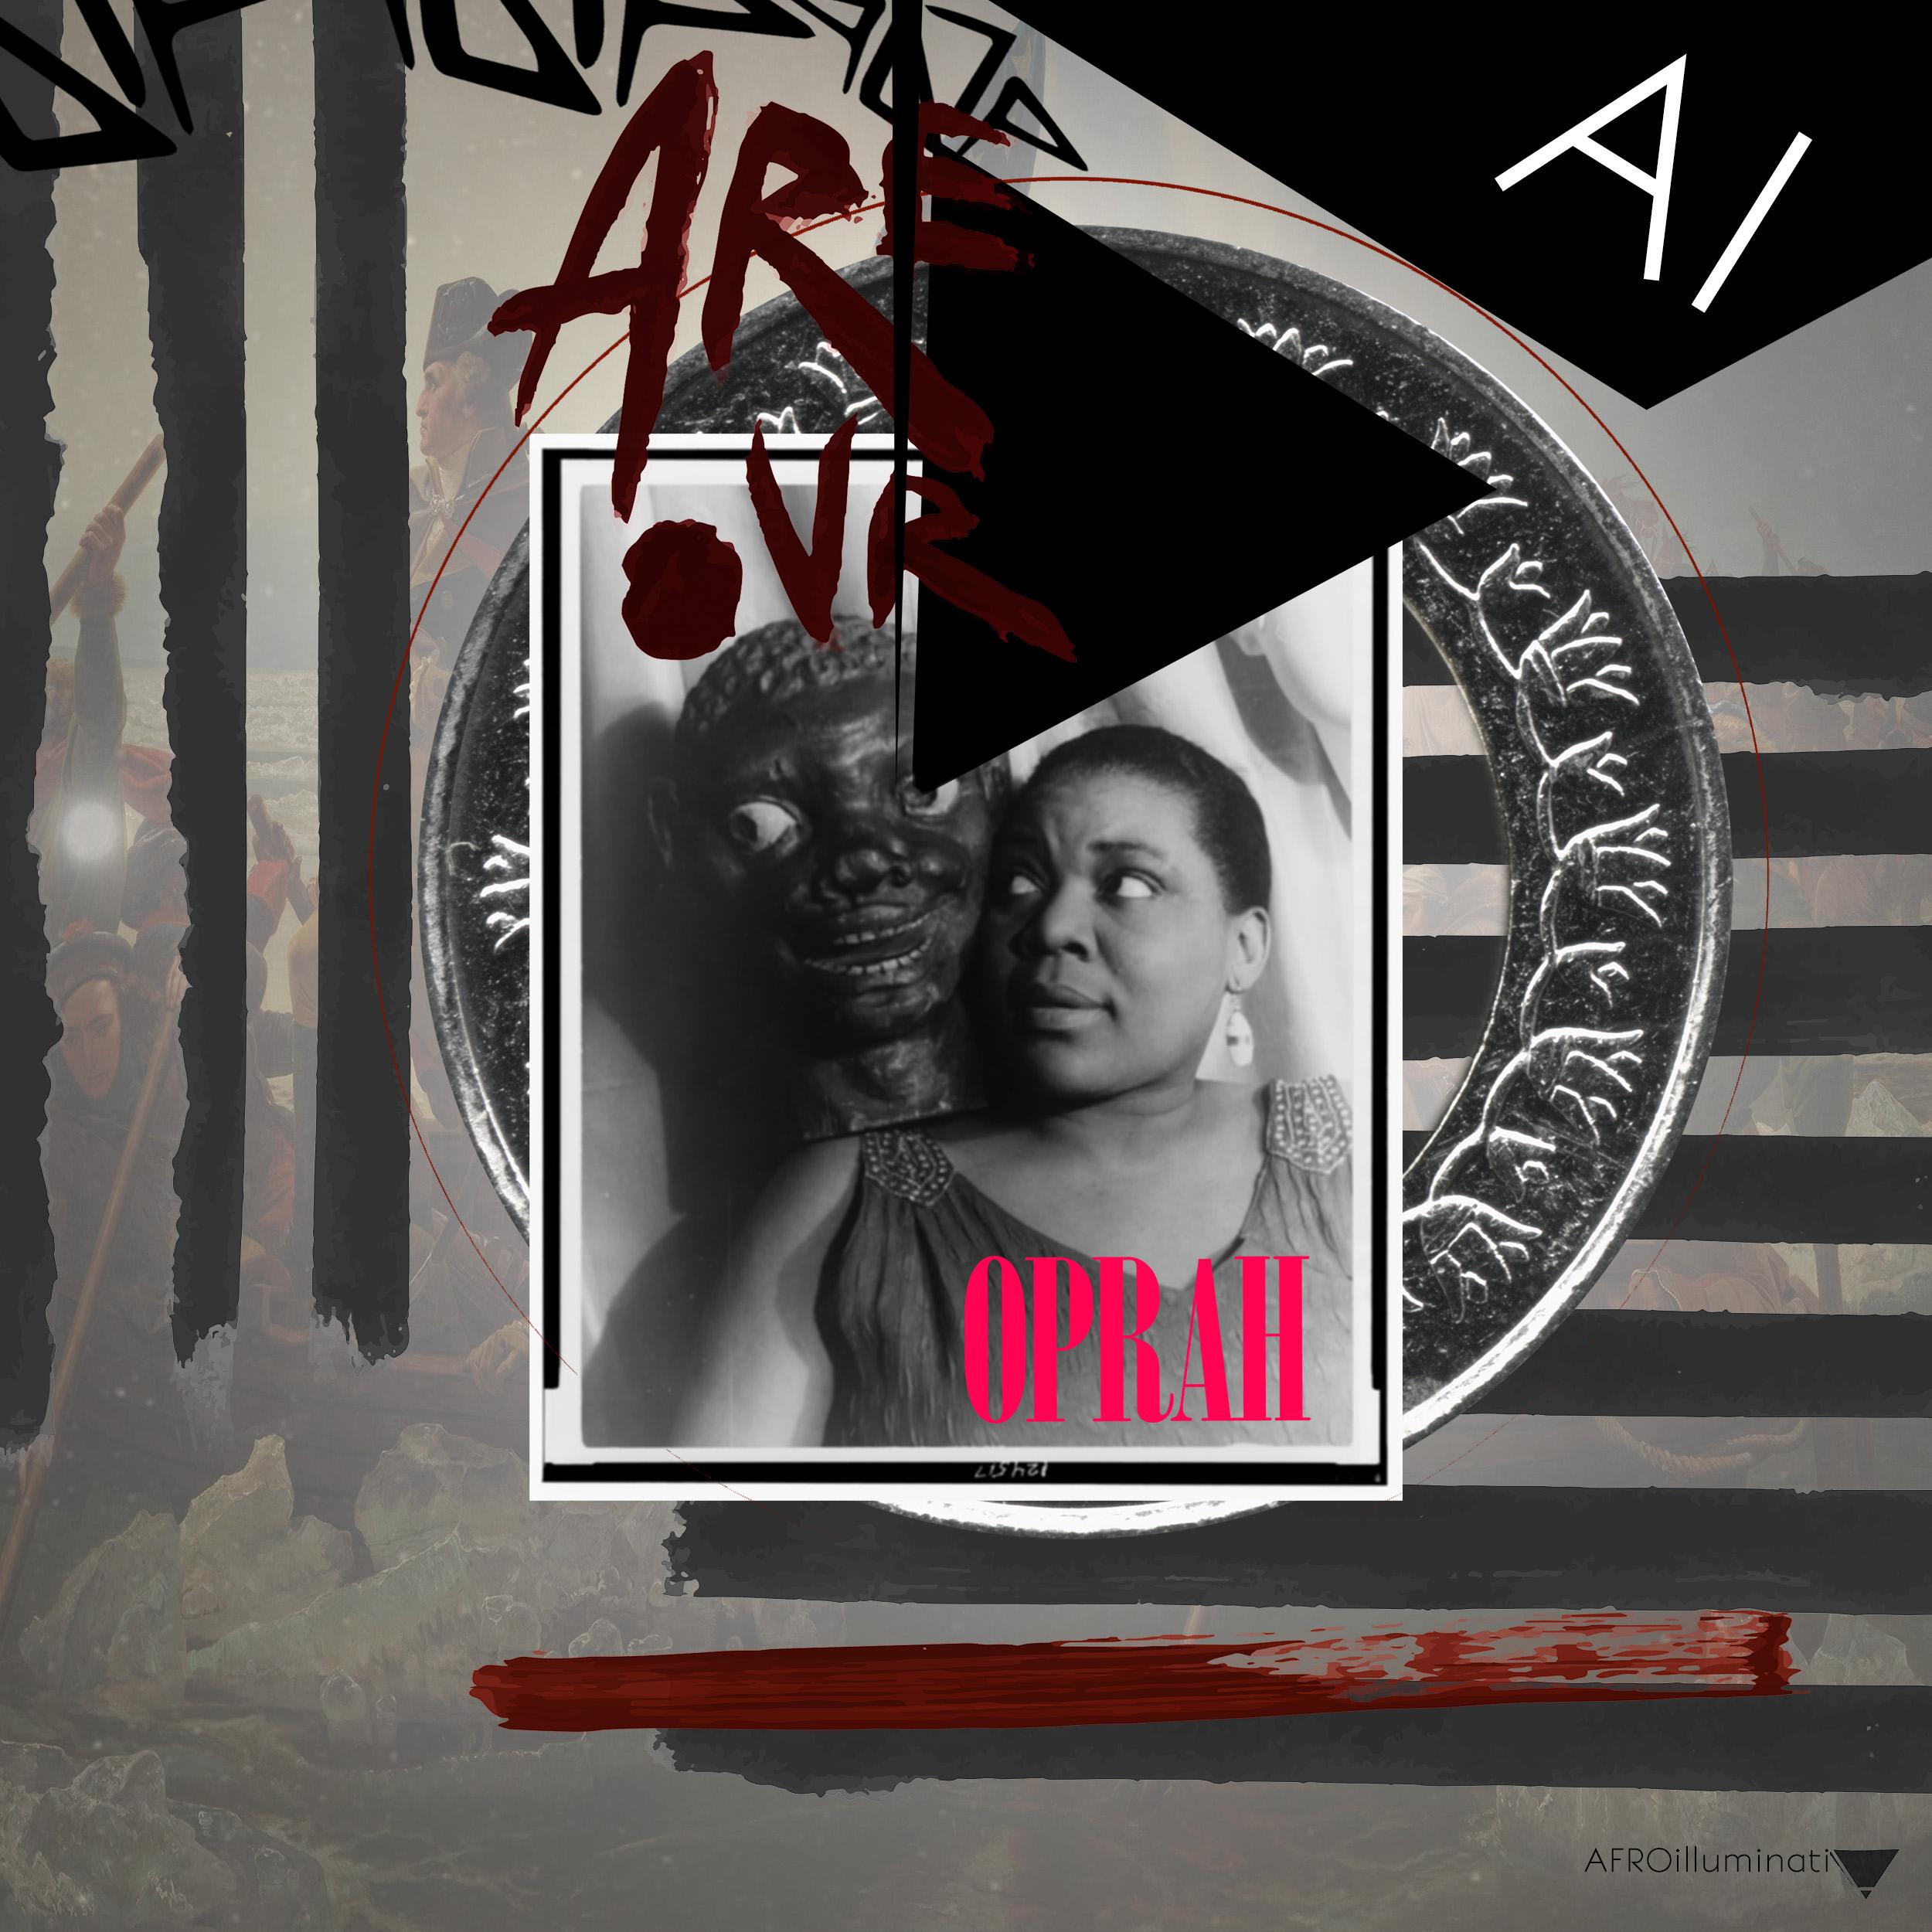 SATURDAY NIGHT SPECIAL 5 AI Bessie Smith OPRAH and WASHINGTON CROSS.jpg